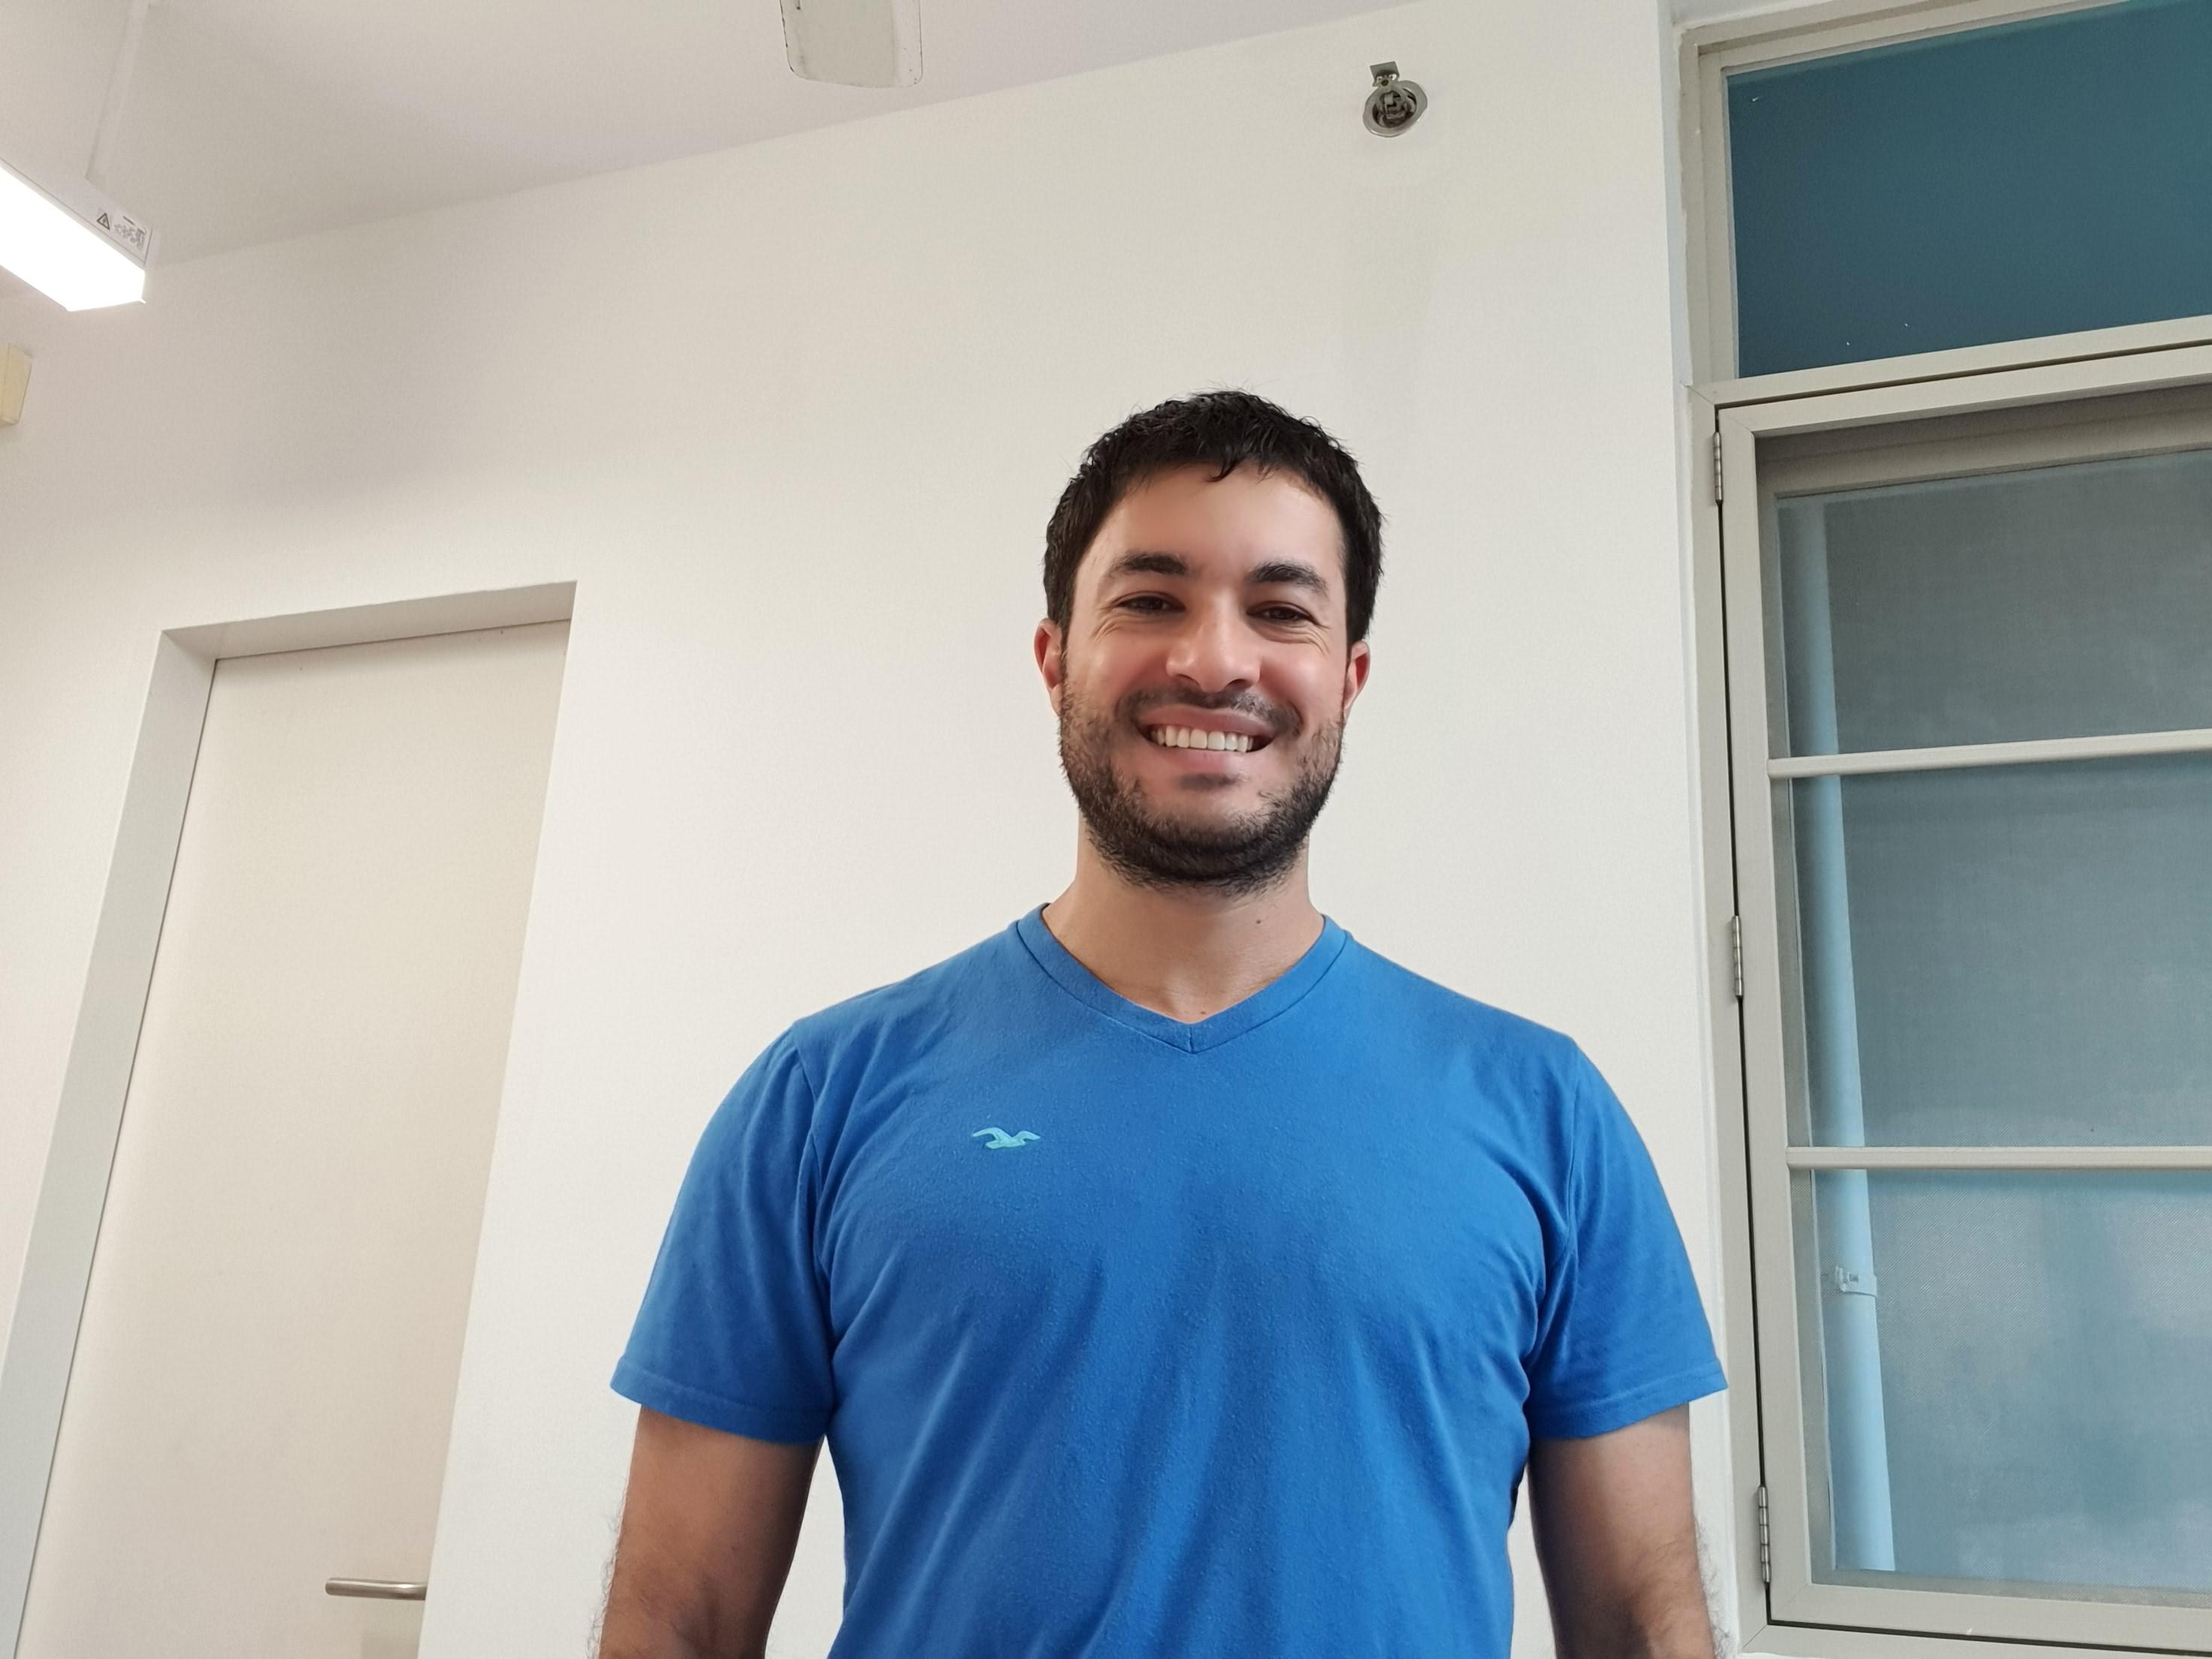 #YoEstudioEnCasa: Entrevista a Uver Darío Villalobos Cardozo, estudiante costarricense becado por FUNIBER